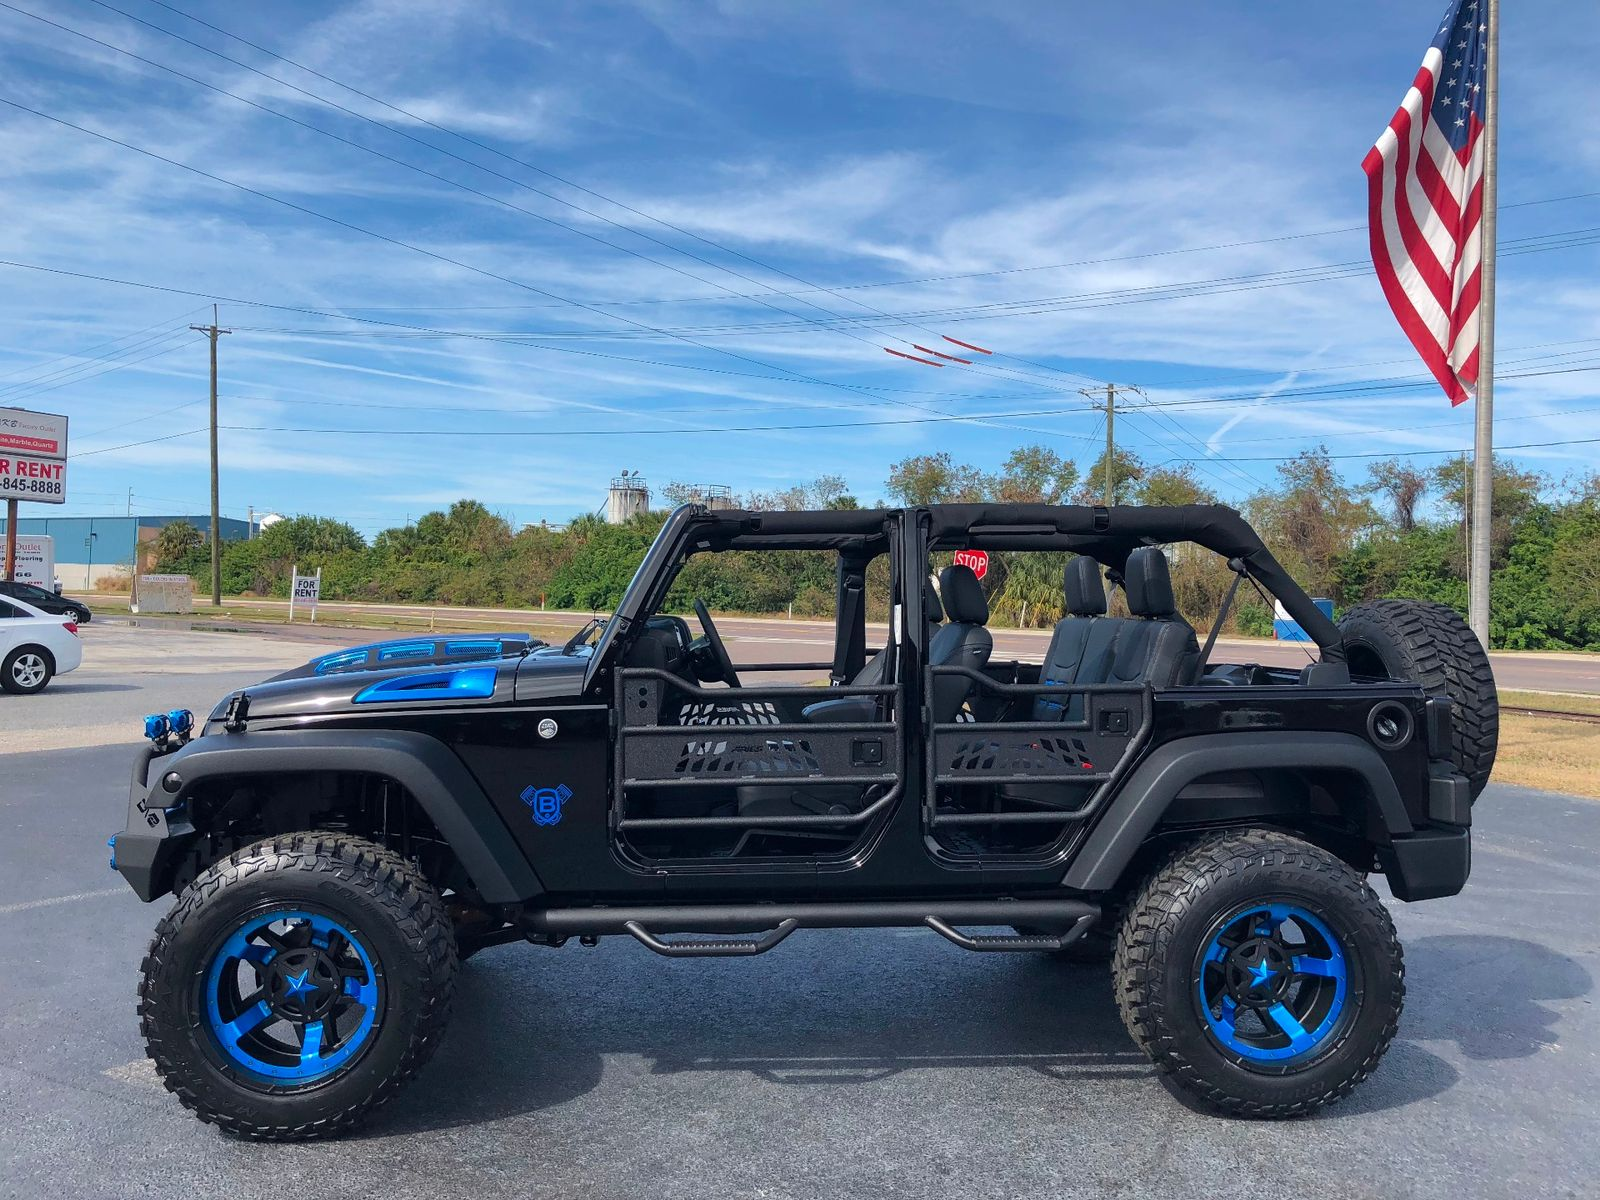 2018 jeep wrangler jk unlimited rubicon black n blue leather hartop heated seats florida. Black Bedroom Furniture Sets. Home Design Ideas